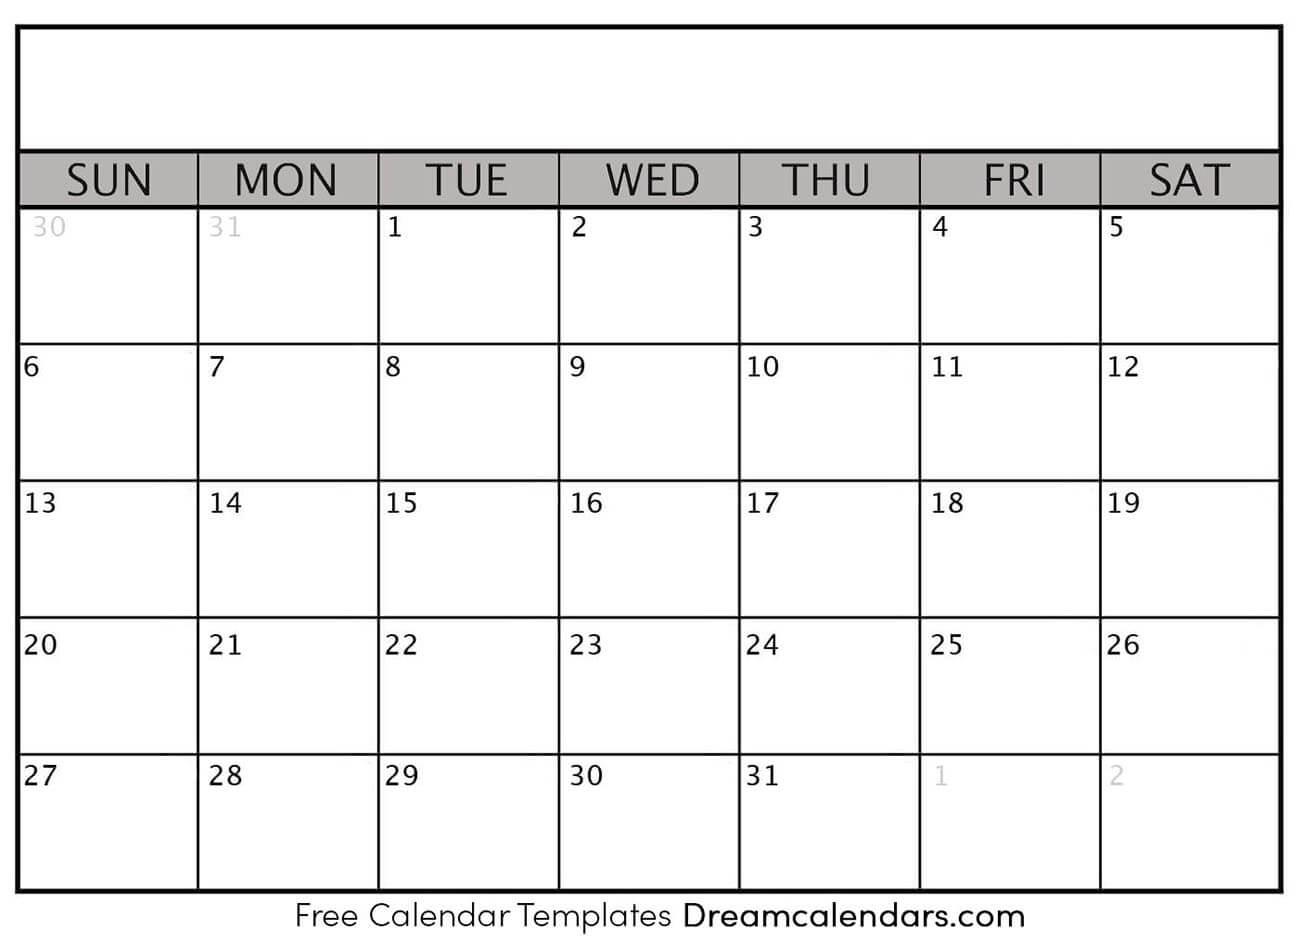 Printable Blank Calendar 2021 | Dream Calendars